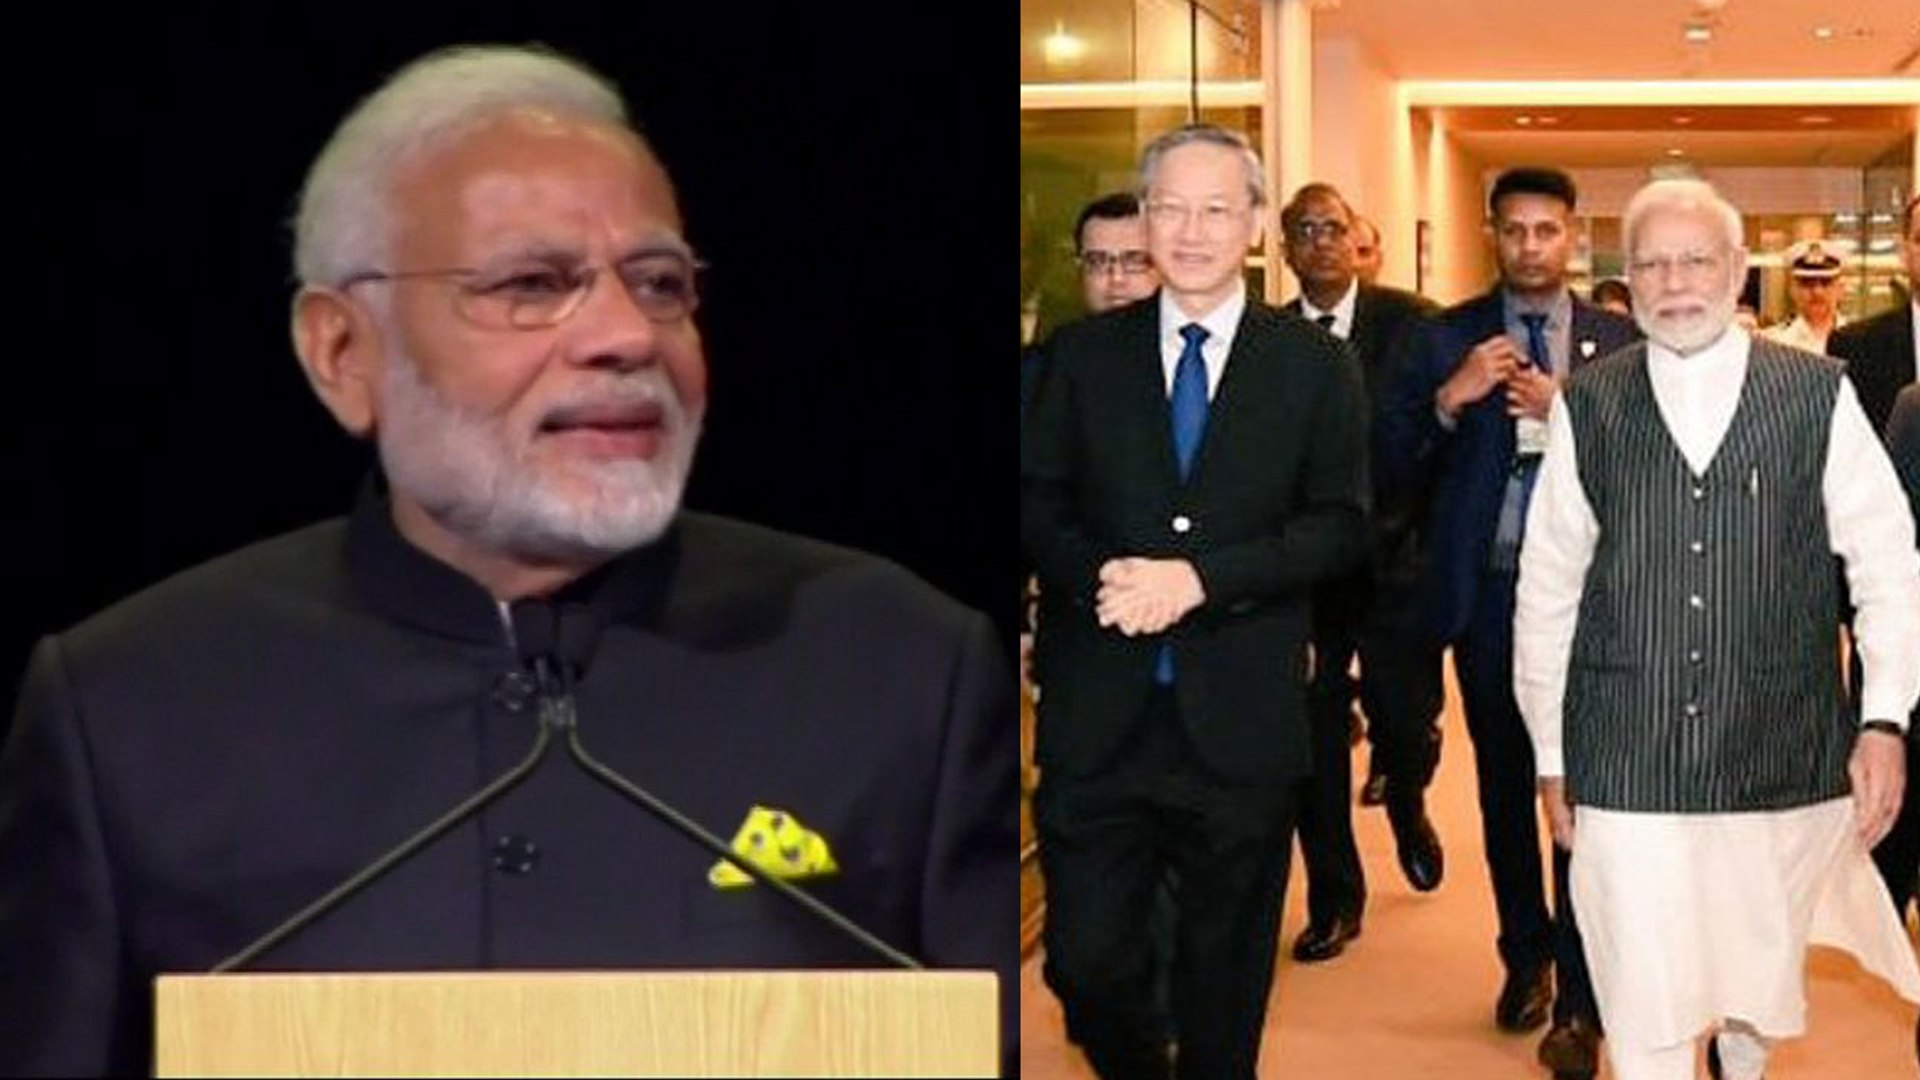 PM Modi in Singapore: Fintech Festival में PM Modi ने दी की नोट Speech । वनइंडिया हिंदी